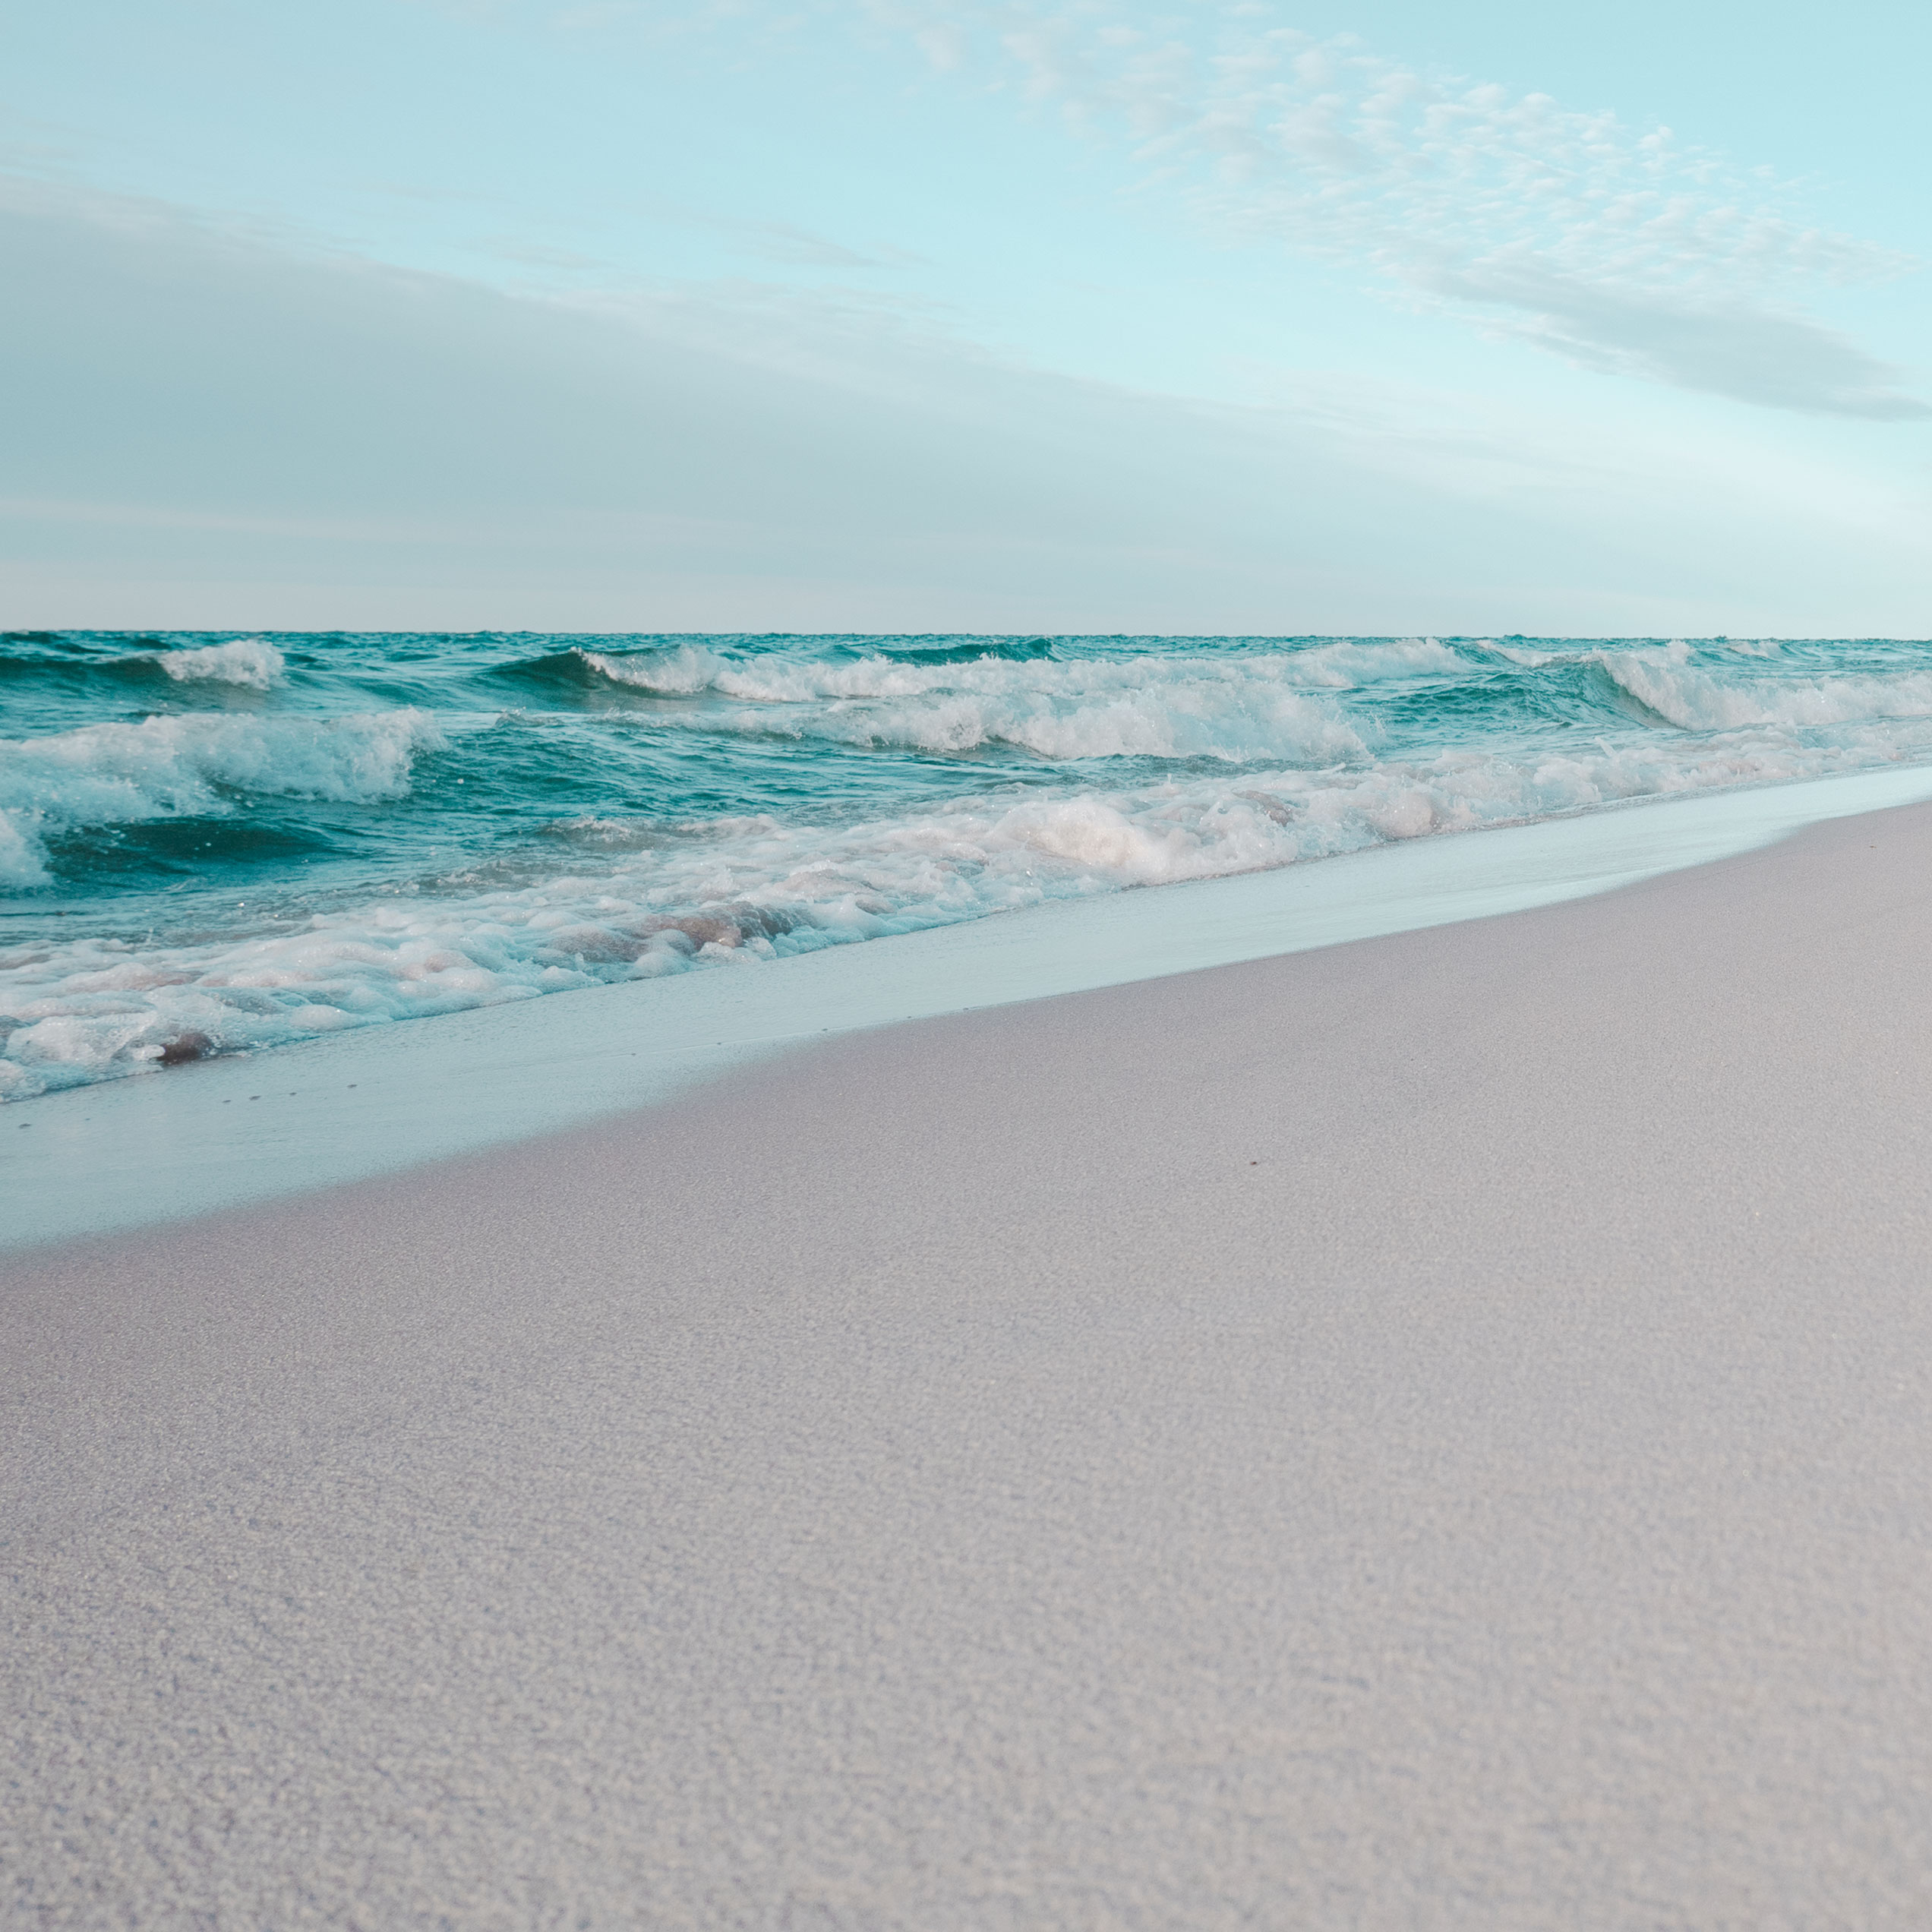 Waves crashing on a Michigan beach